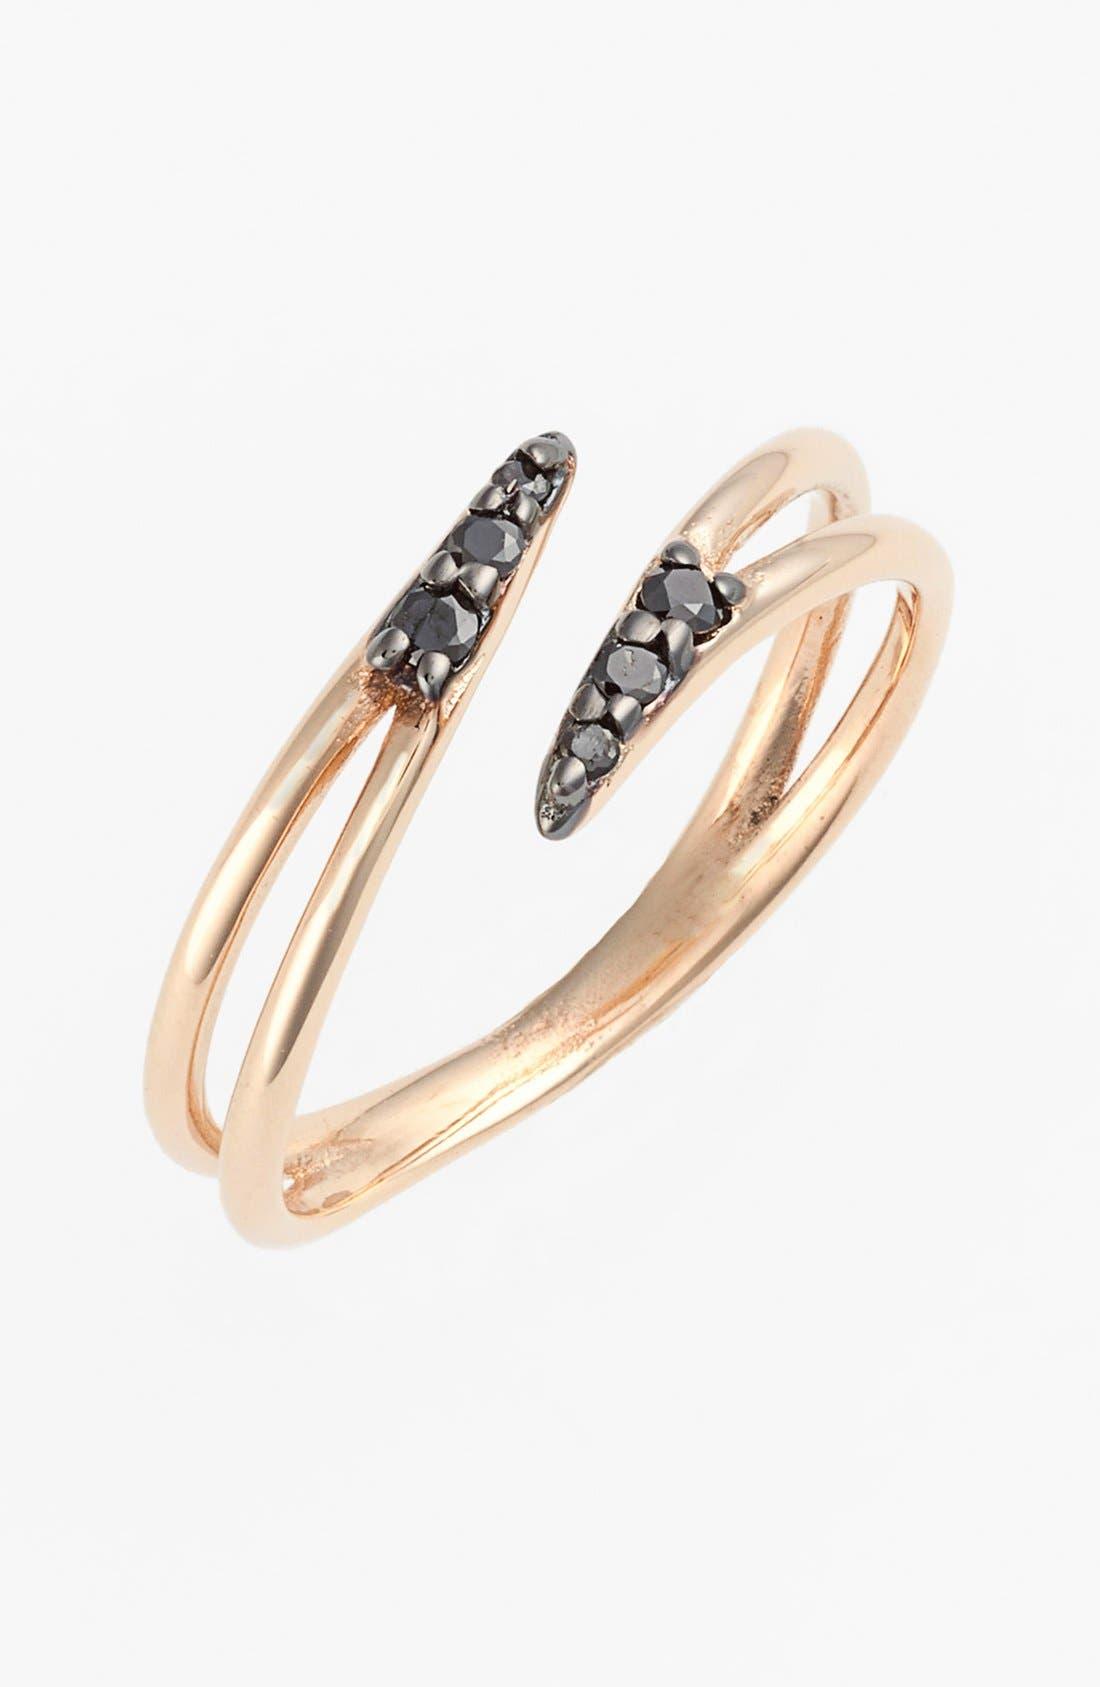 Main Image - kismet by milka 'Lumiere' Diamond Midi Ring